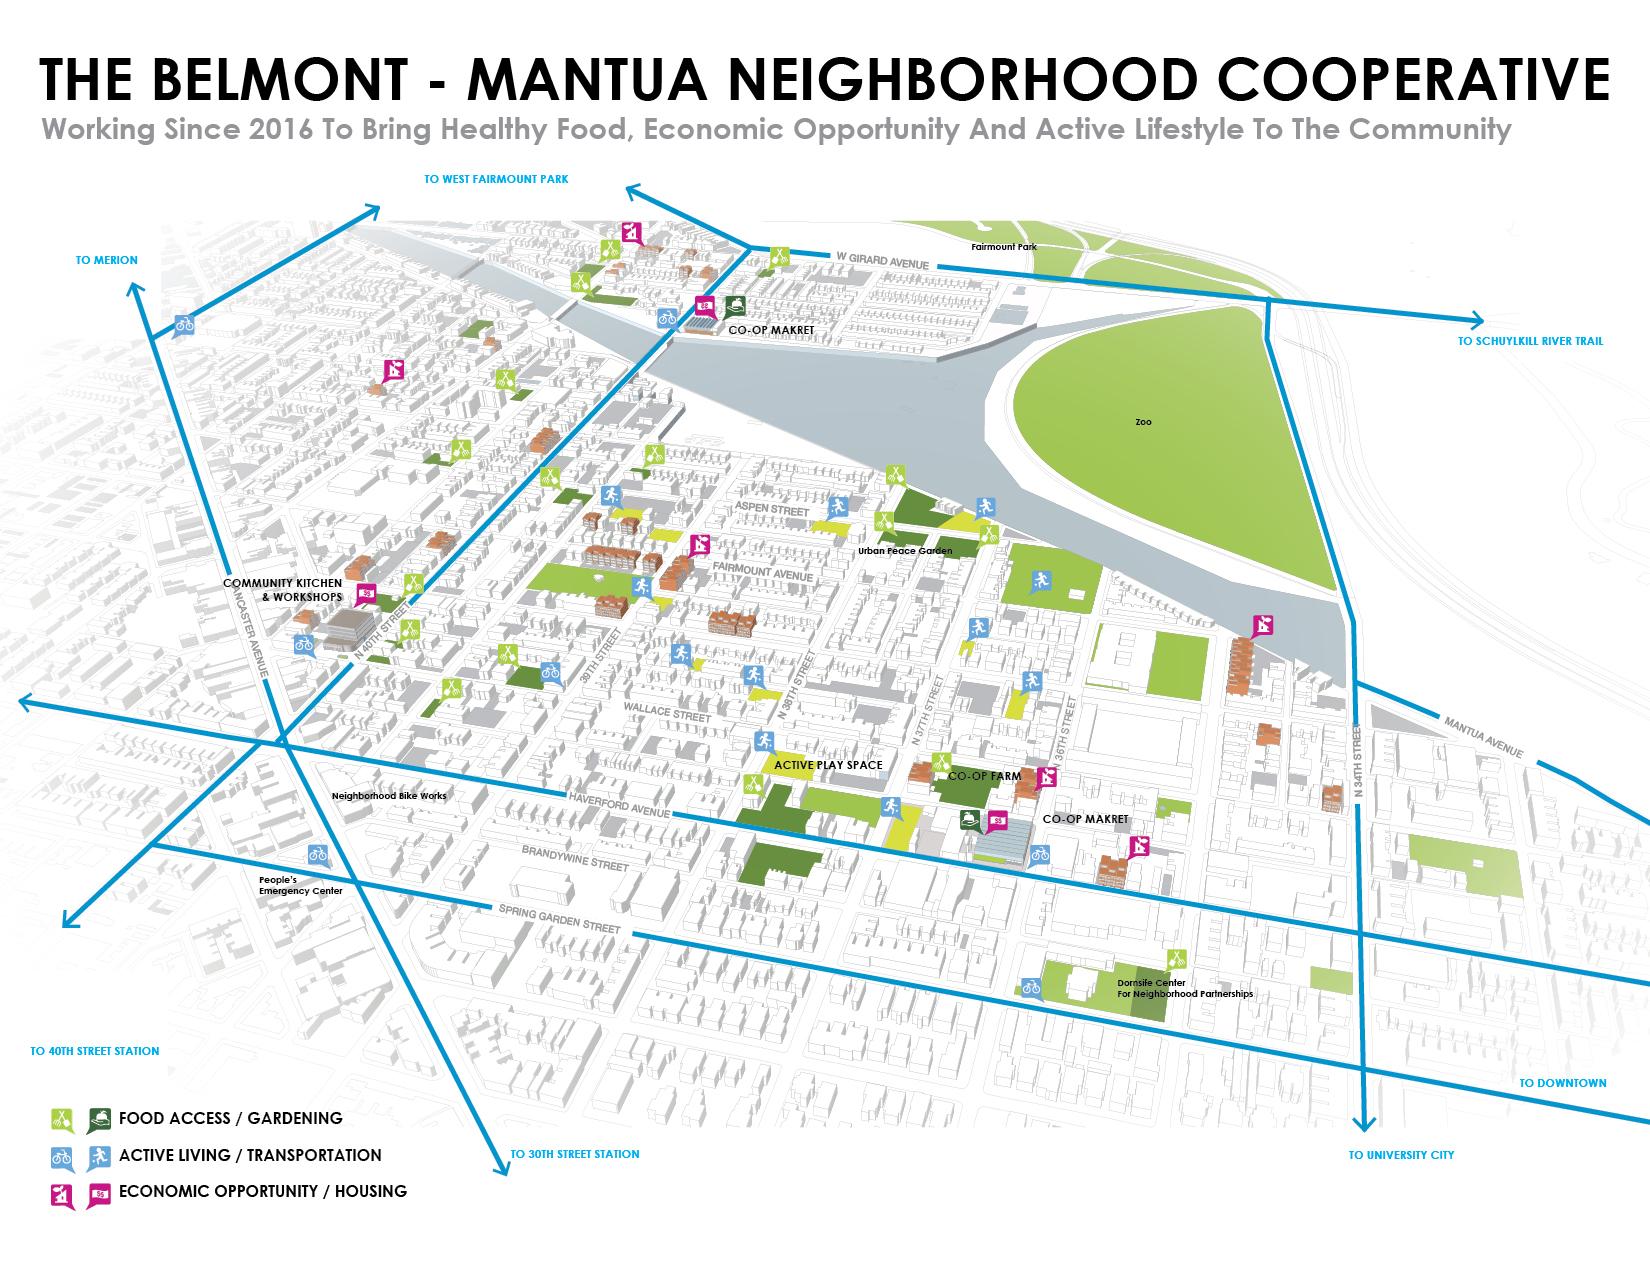 Cooperative Neighborhoods